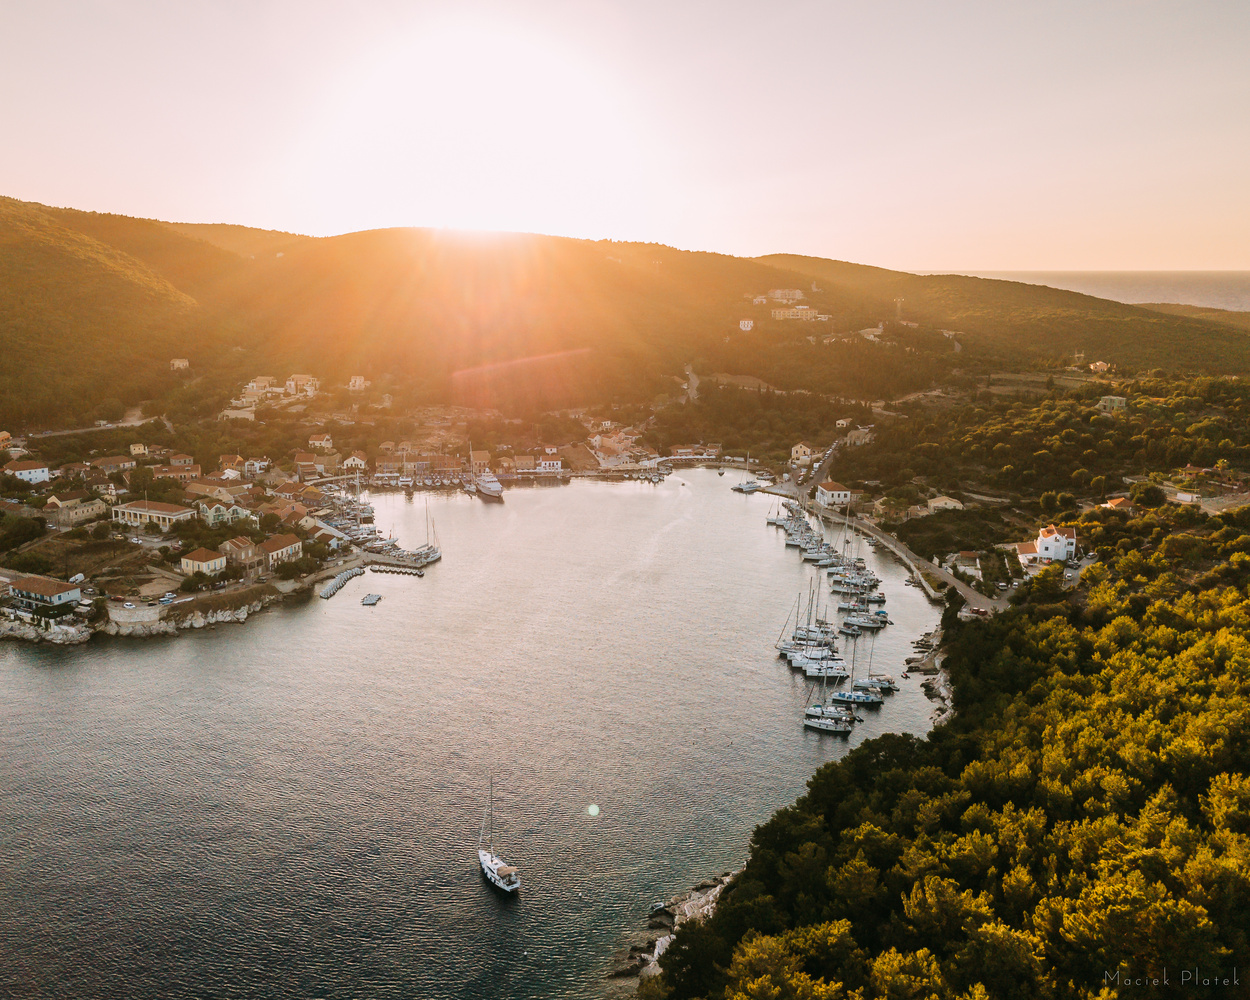 Mediterranean Sunsets by Maciek Platek